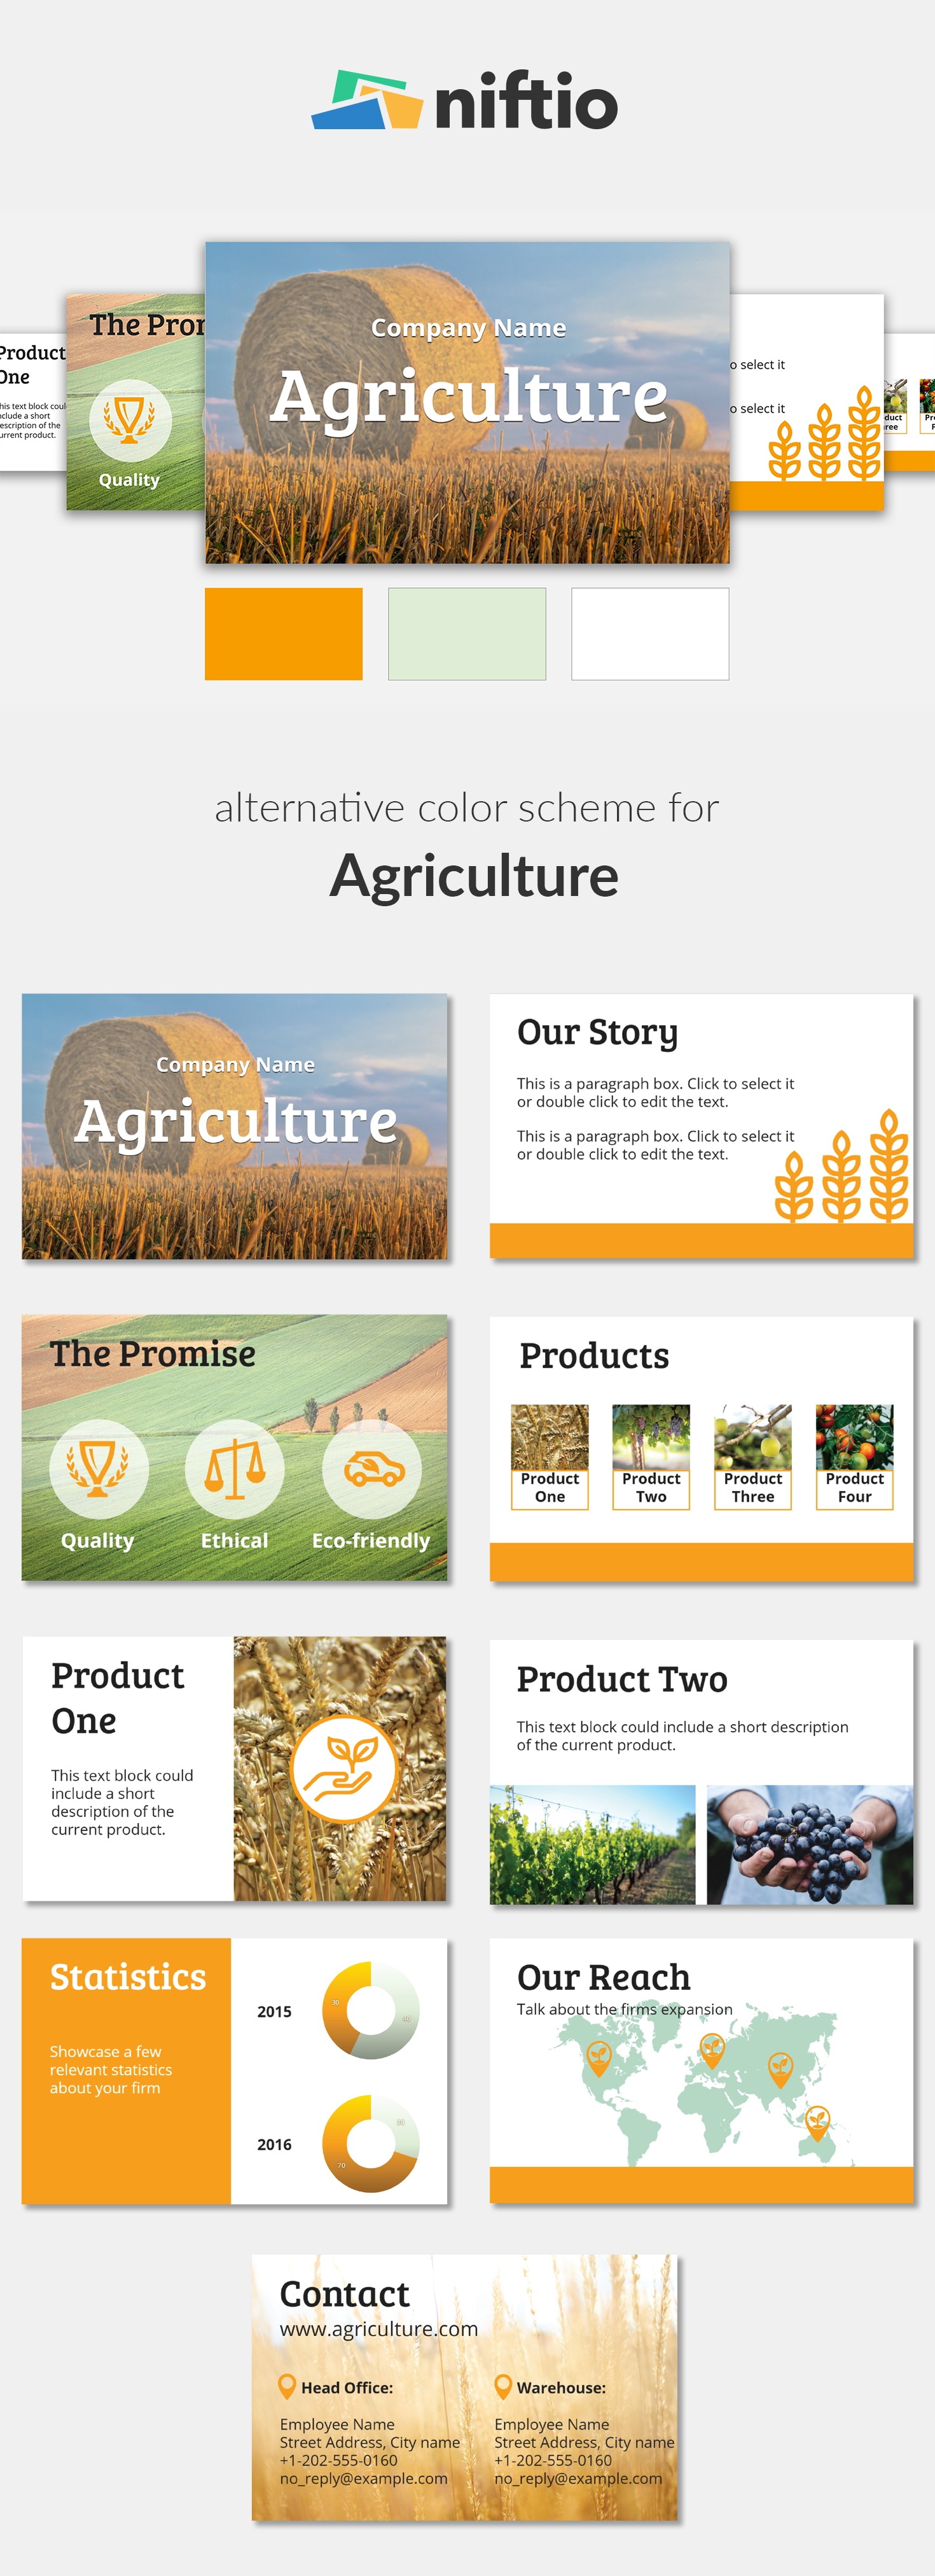 agribusiness presentation template | agriculture alternative color, Presentation templates